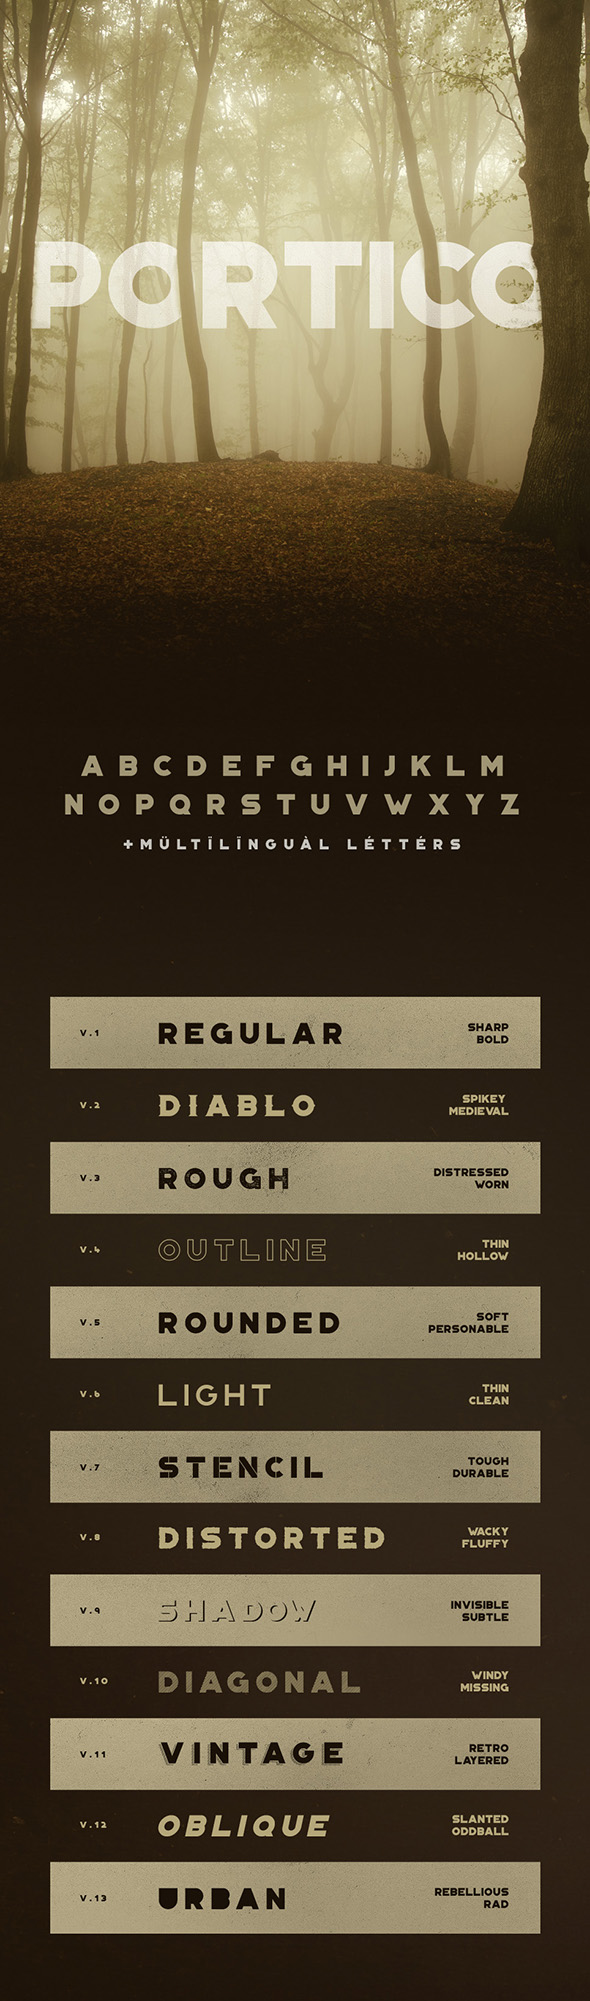 portico-typeface